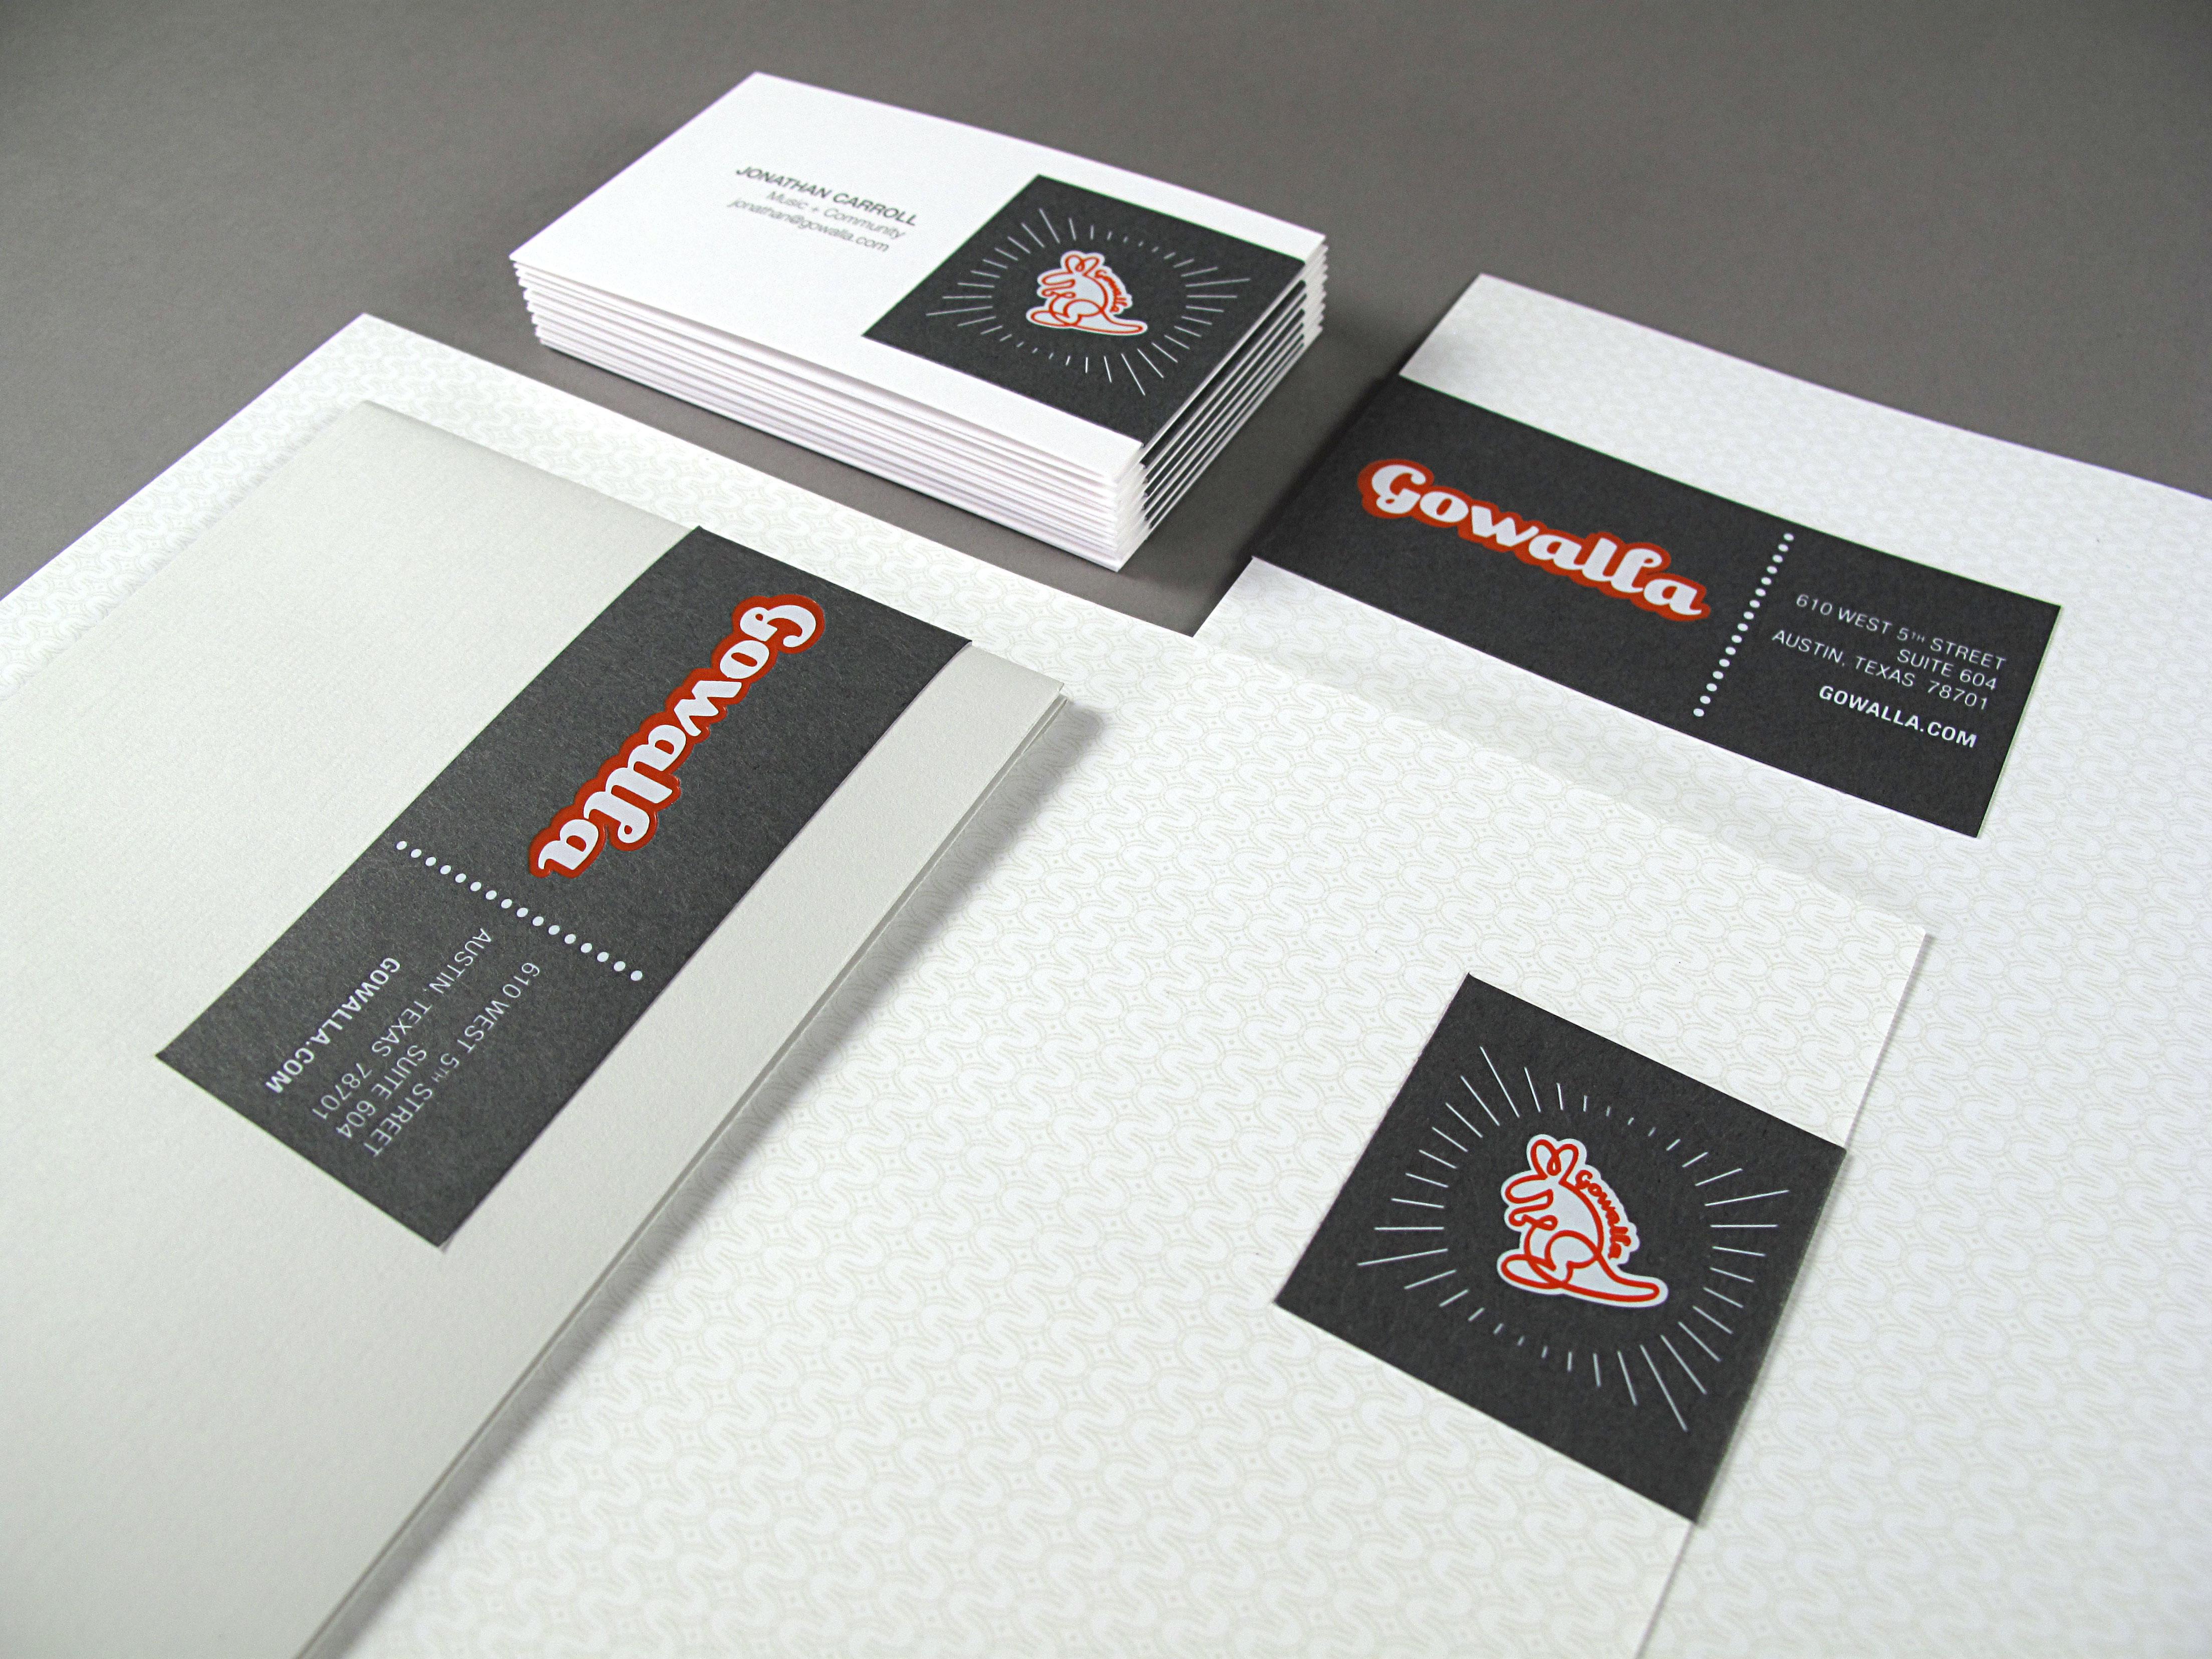 judyisokay Paper Graphics Gallery